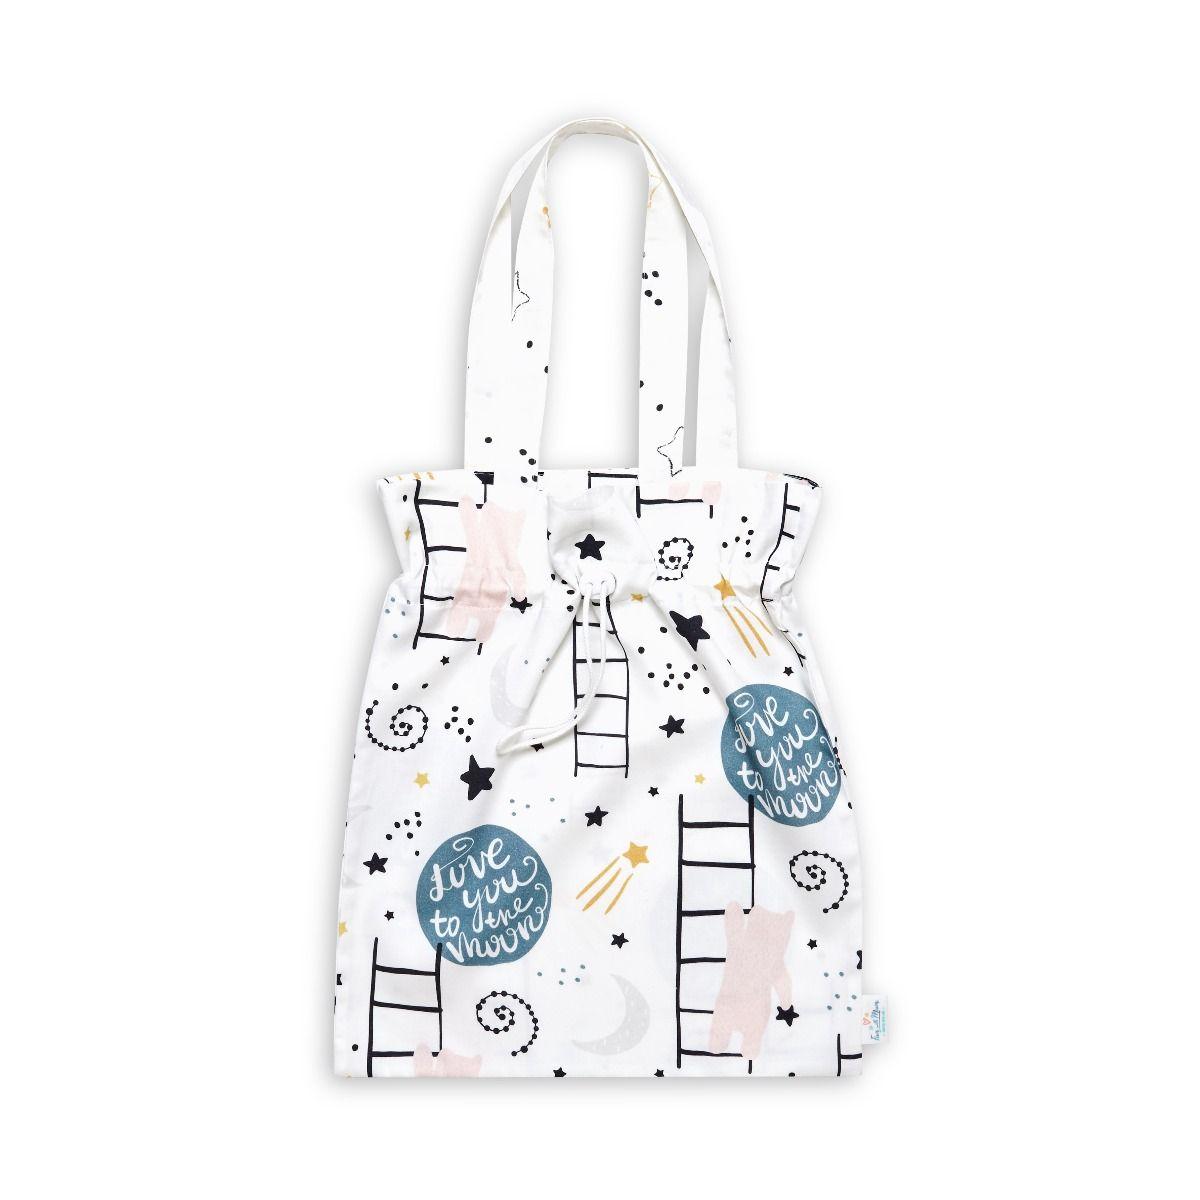 Drawstring Bag - Love to the Moon